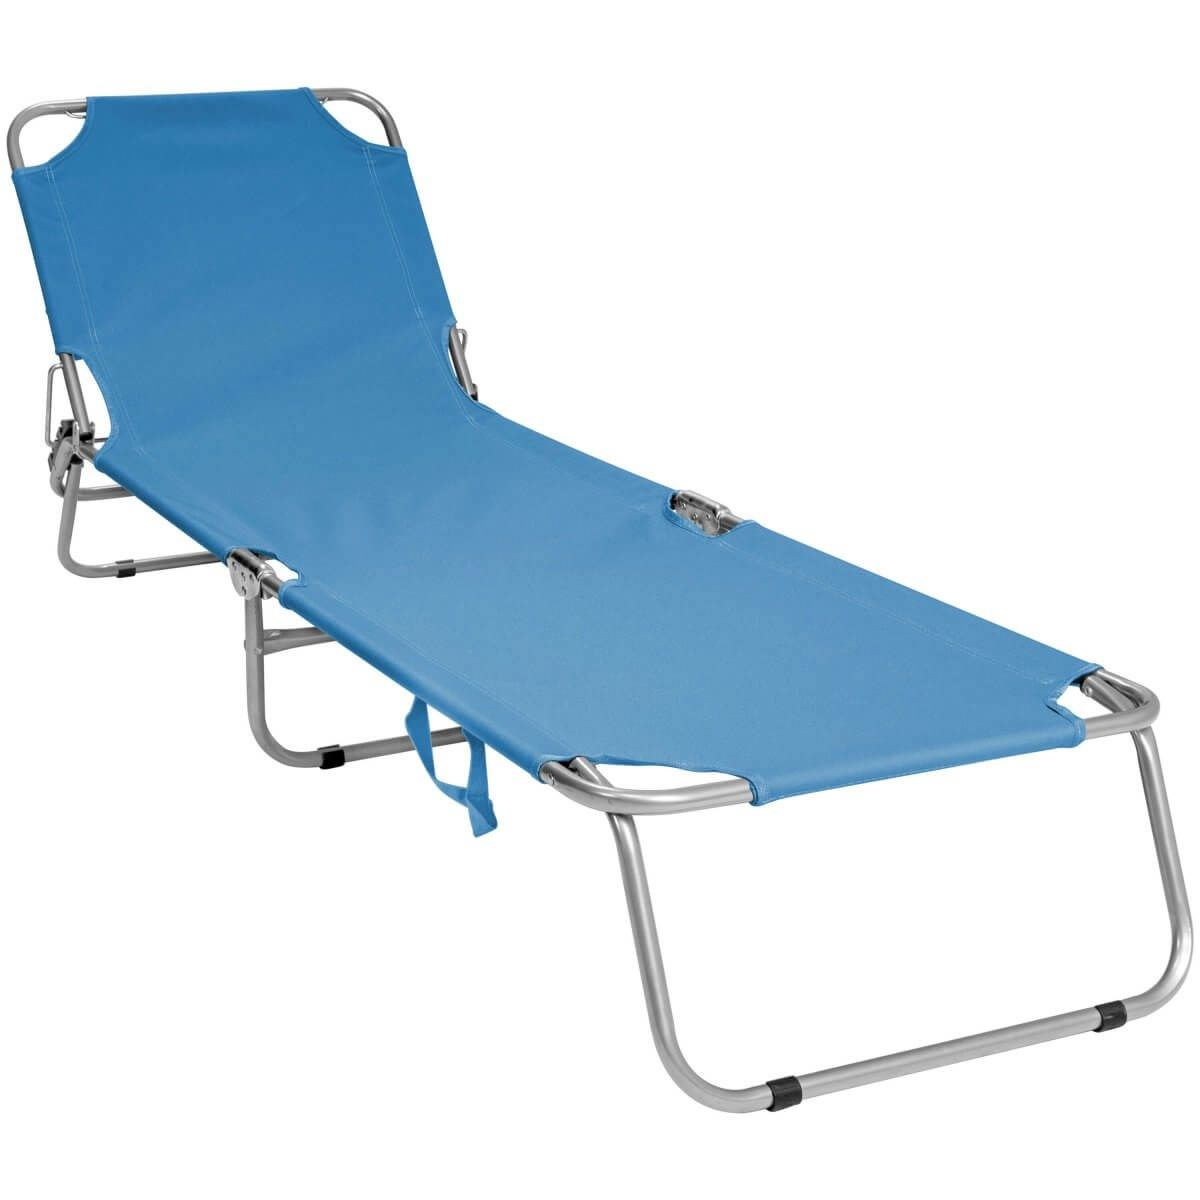 Folding Sun Lounger Available In 3 Colours Sun Lounger Folding